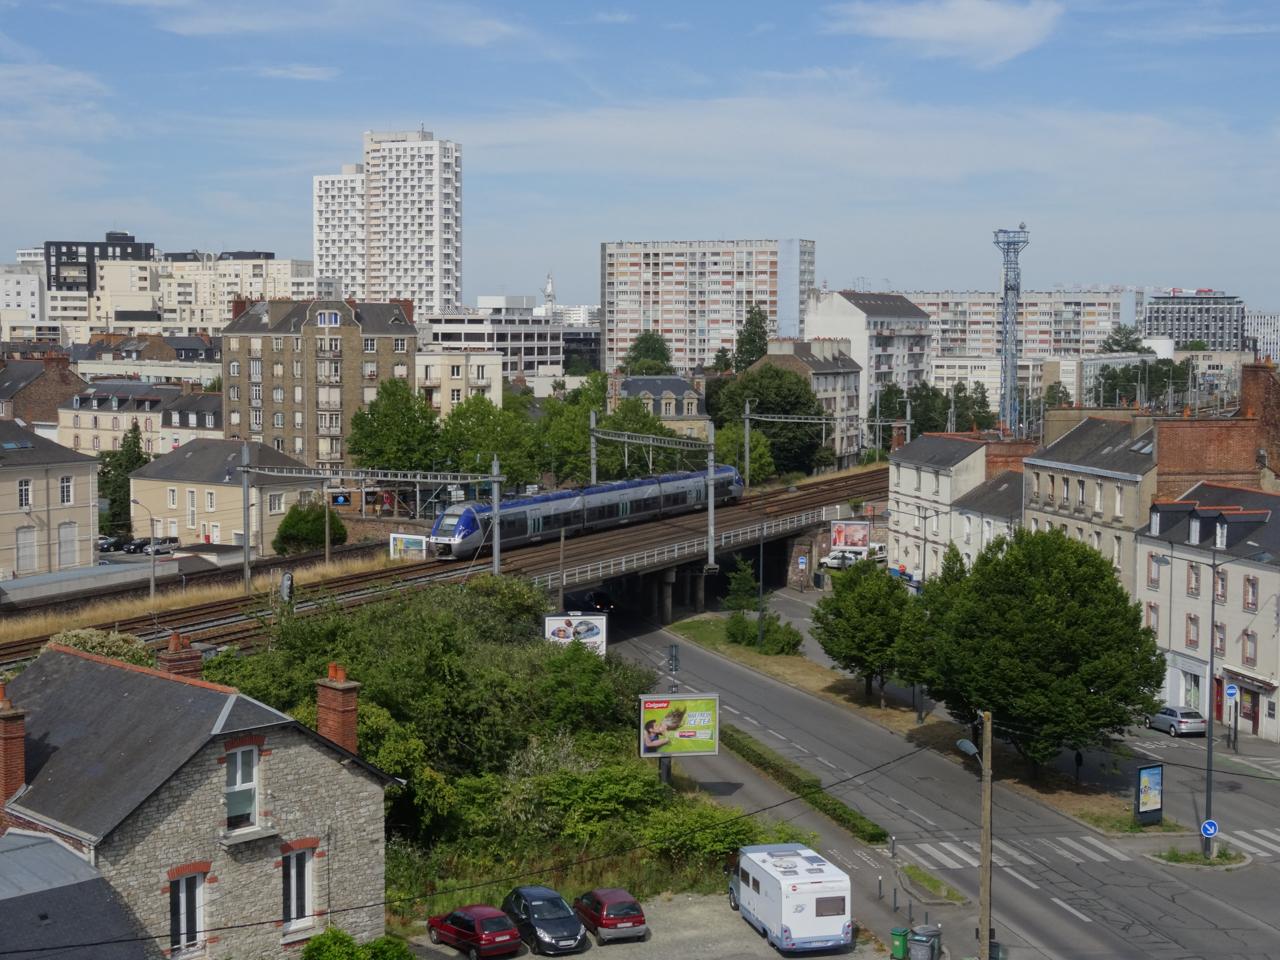 Où investir dans l'immobilier en France?